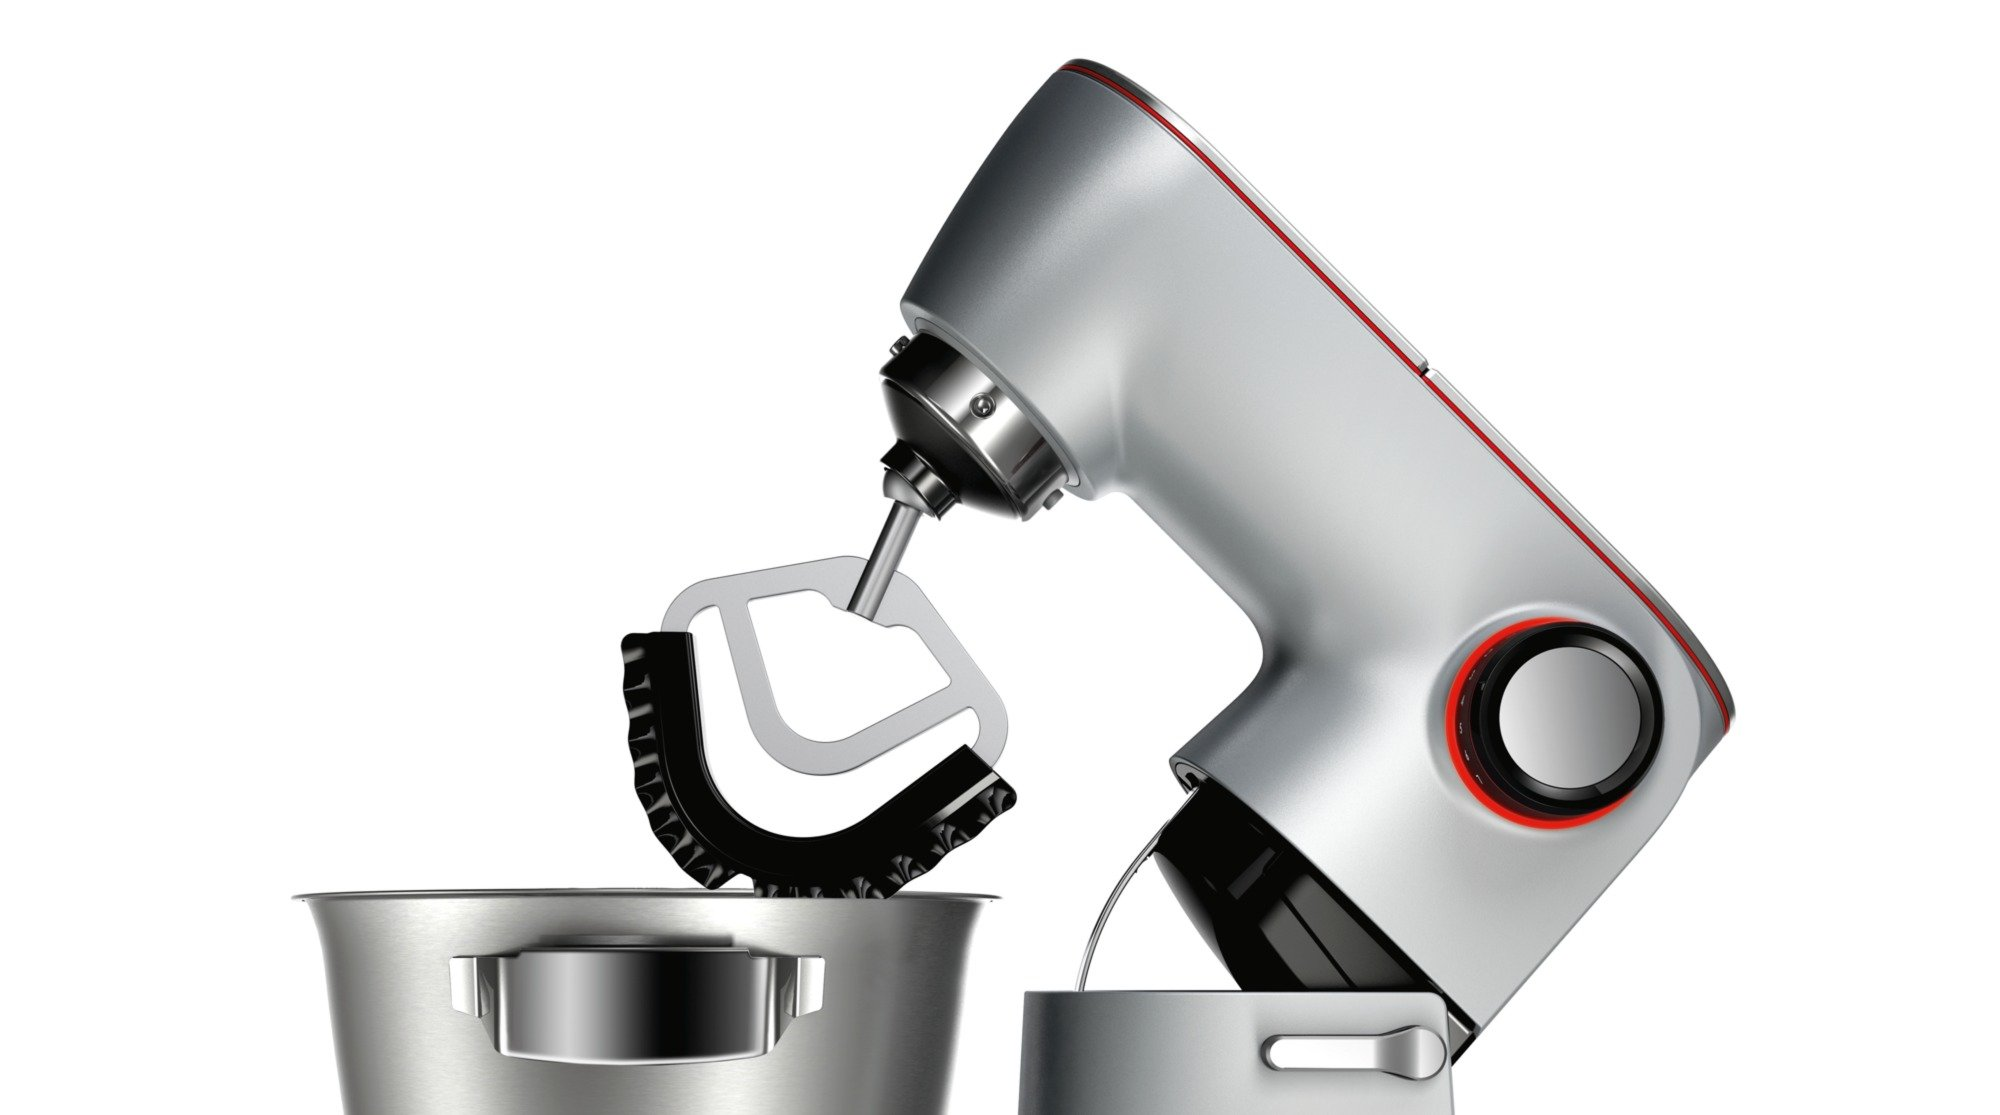 Bosch-MUM9AX5S00-Optimum-Kchenmaschine-1500-Watt-mit-integrierter-Waage-SensorControl-Plus-55-Liter-Edelstahl-Rhrschssel-platinum-silber